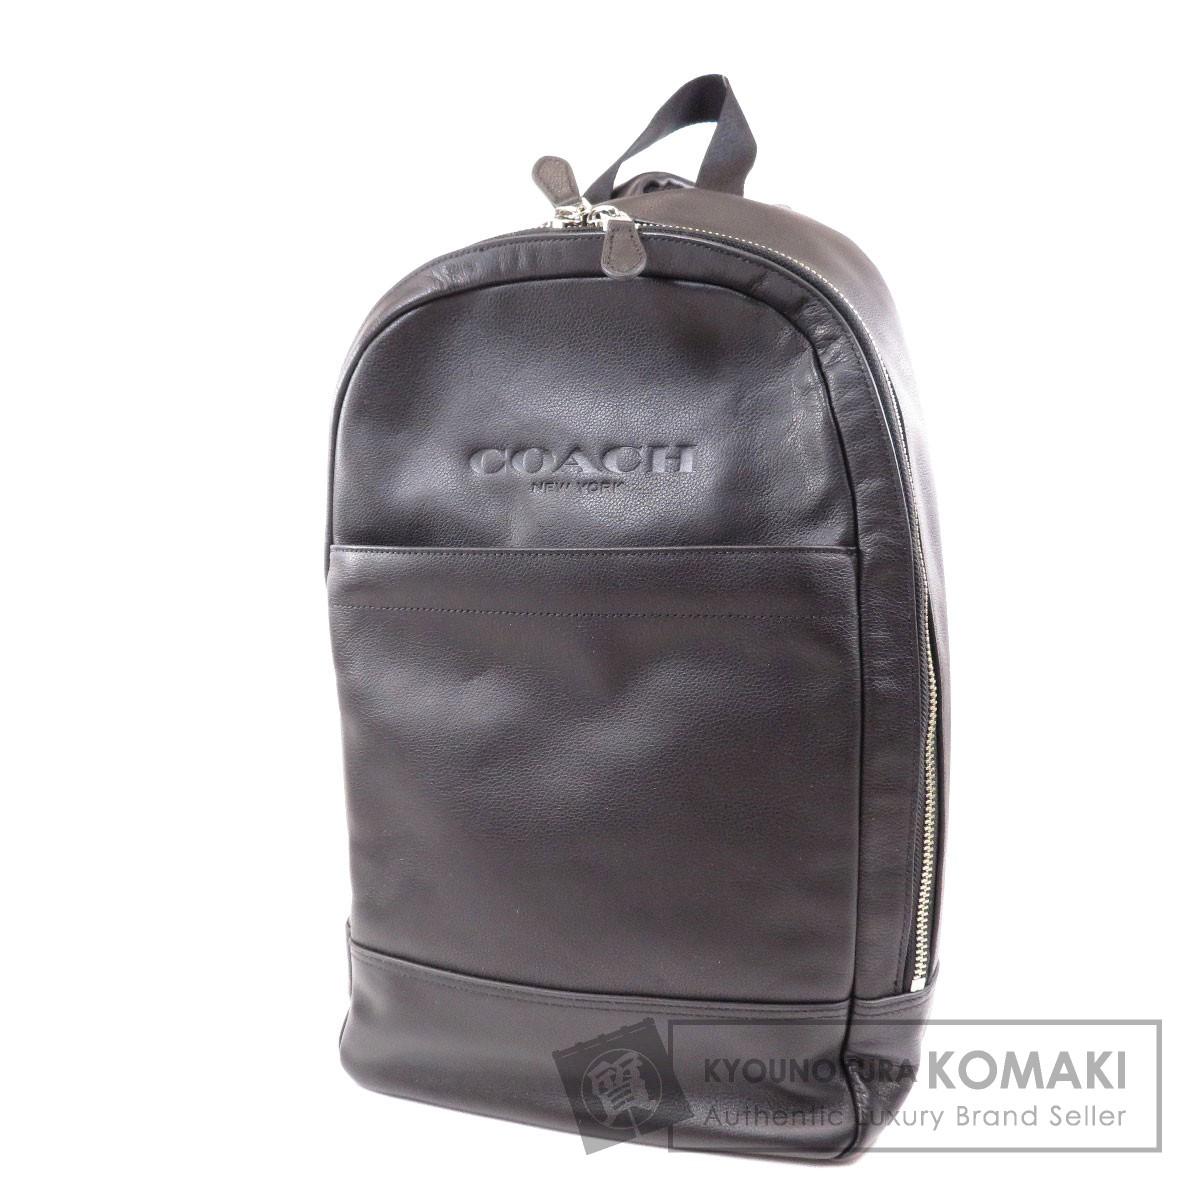 COACH F54135 リュック・デイパック レザー レディース 【中古】【コーチ】